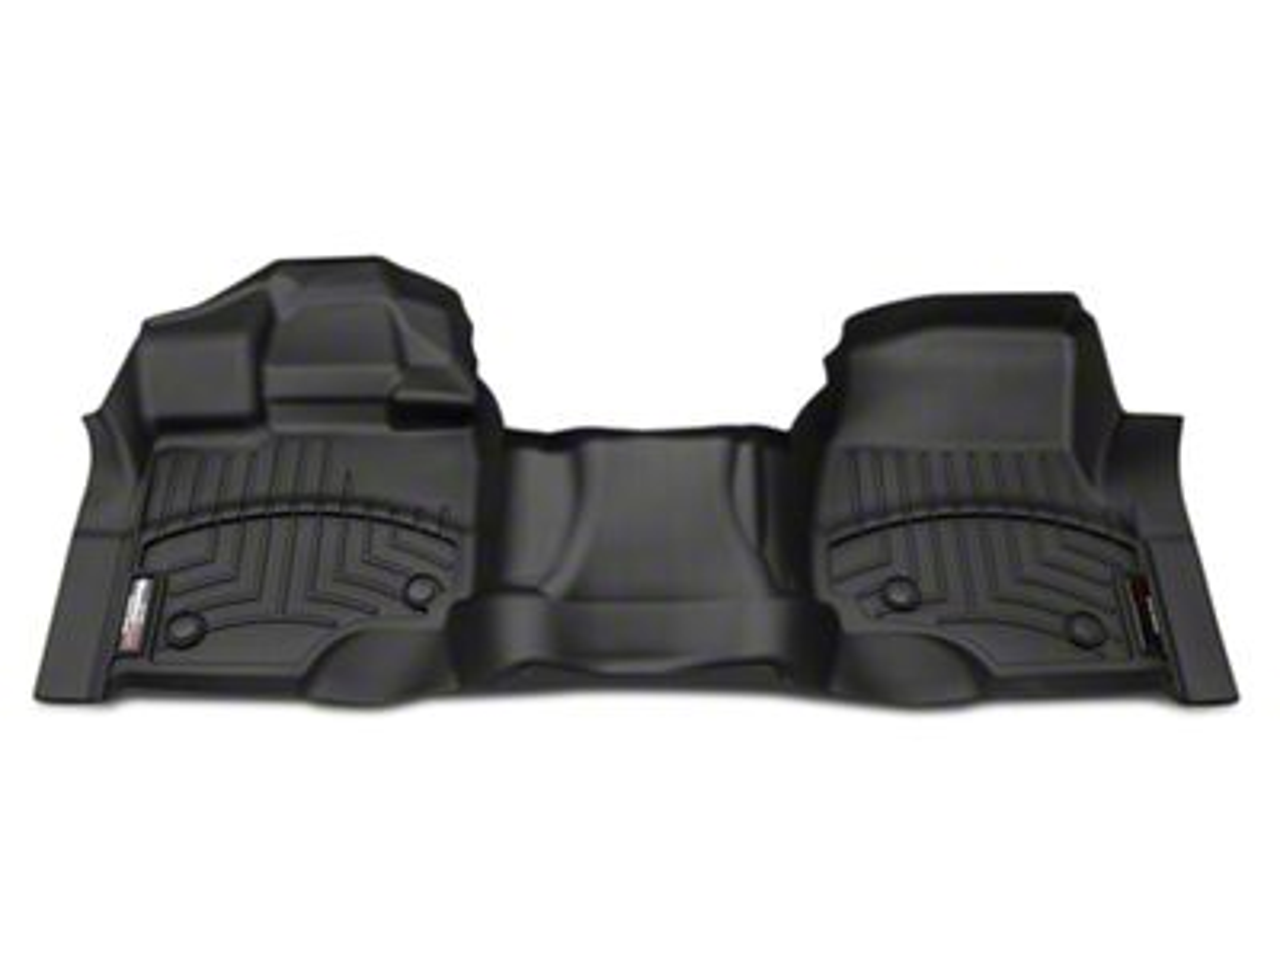 Weathertech DigitalFit Front Floor Liners - Black (15-19 F-150 SuperCab, SuperCrew w/ Bench Seat & Vinyl Floors)